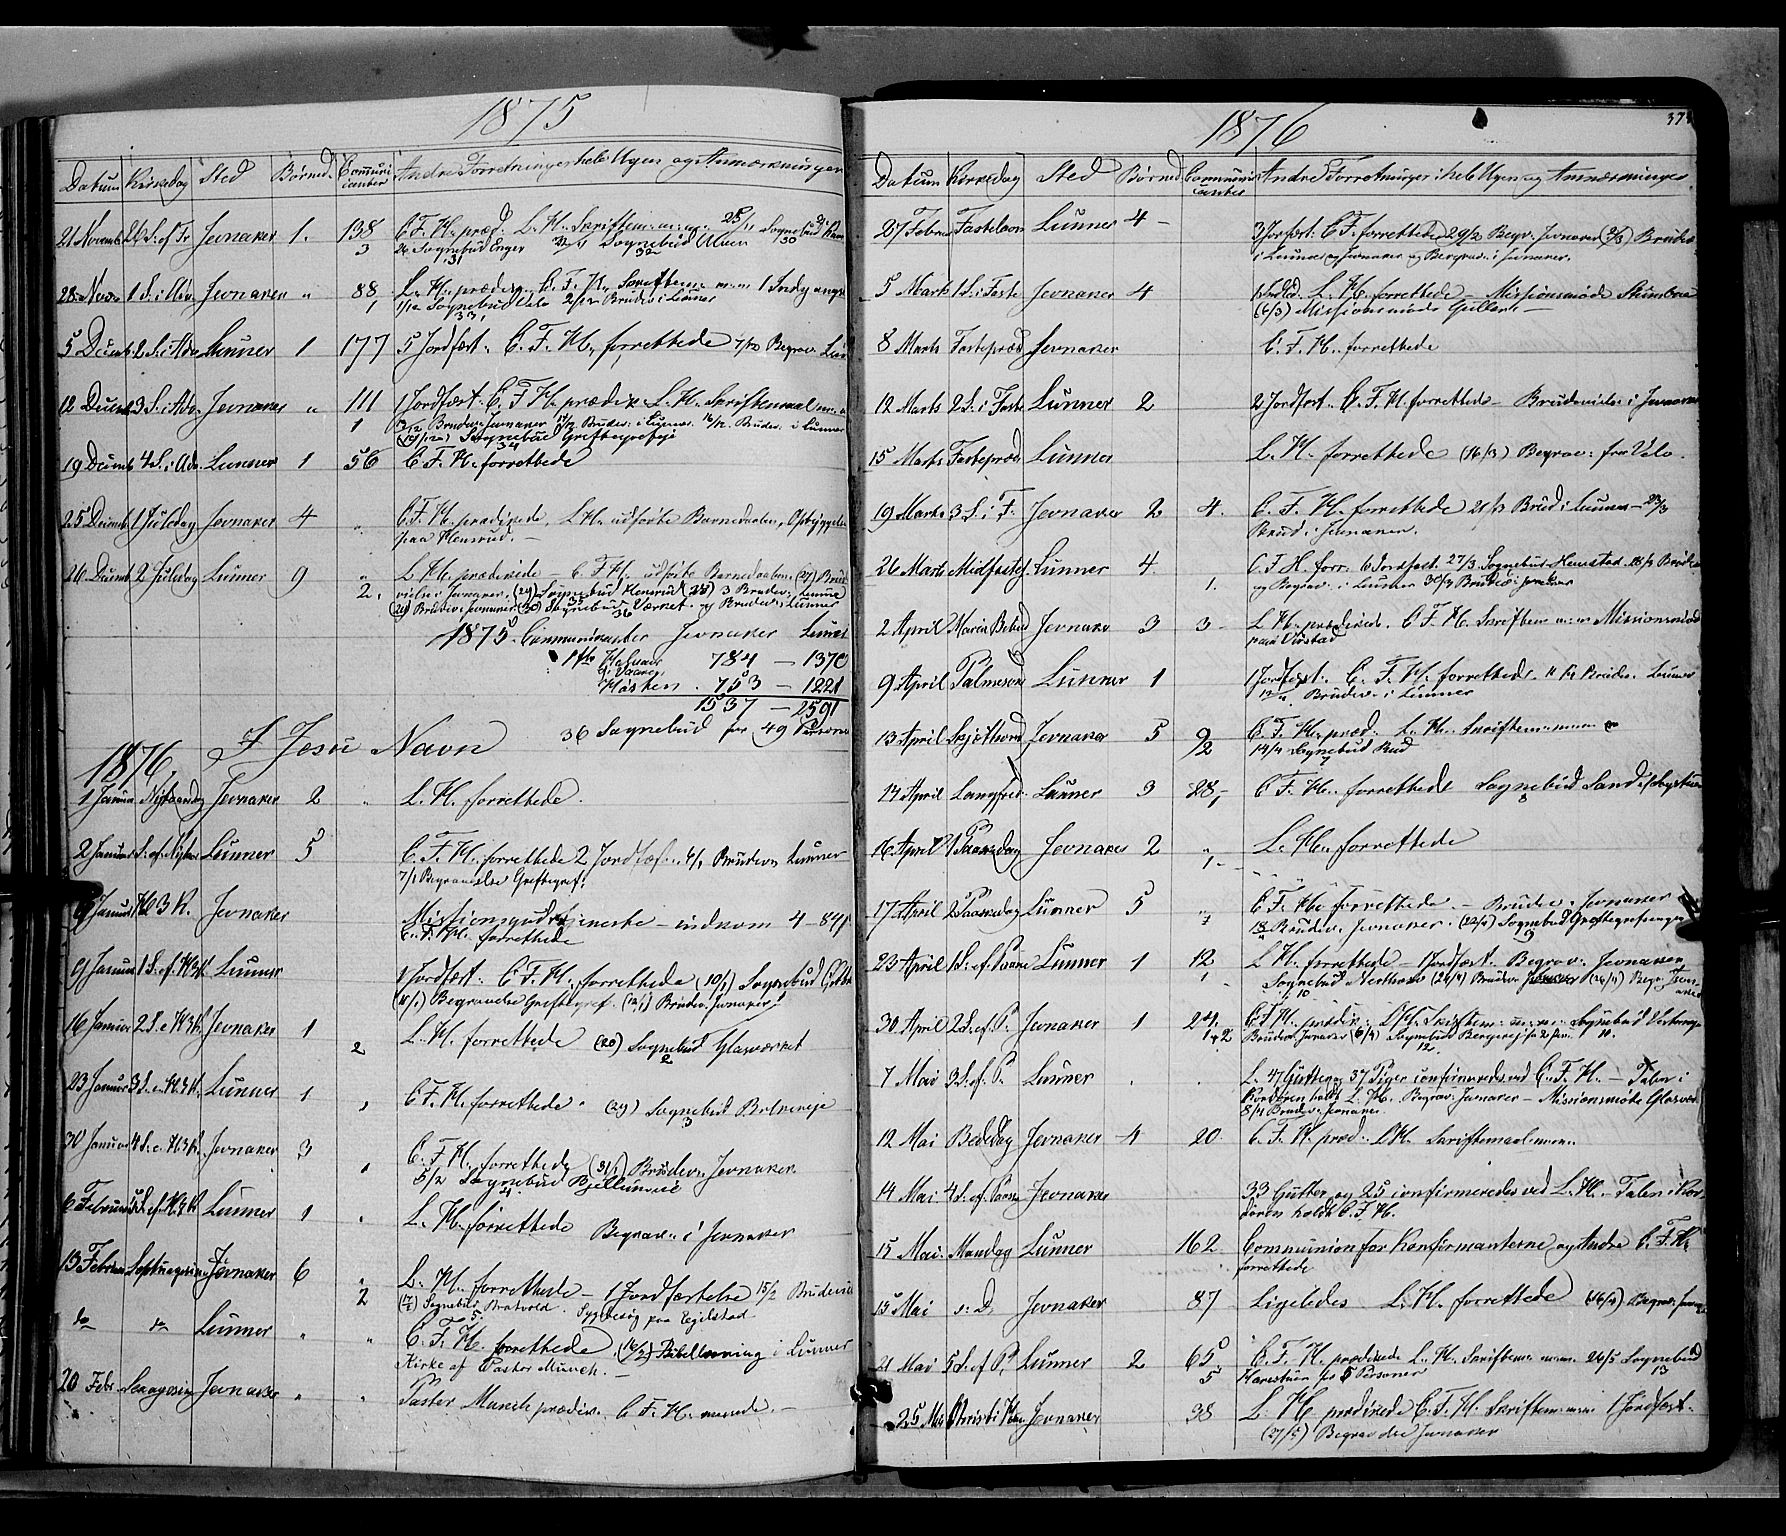 SAH, Jevnaker prestekontor, Ministerialbok nr. 7, 1858-1876, s. 375